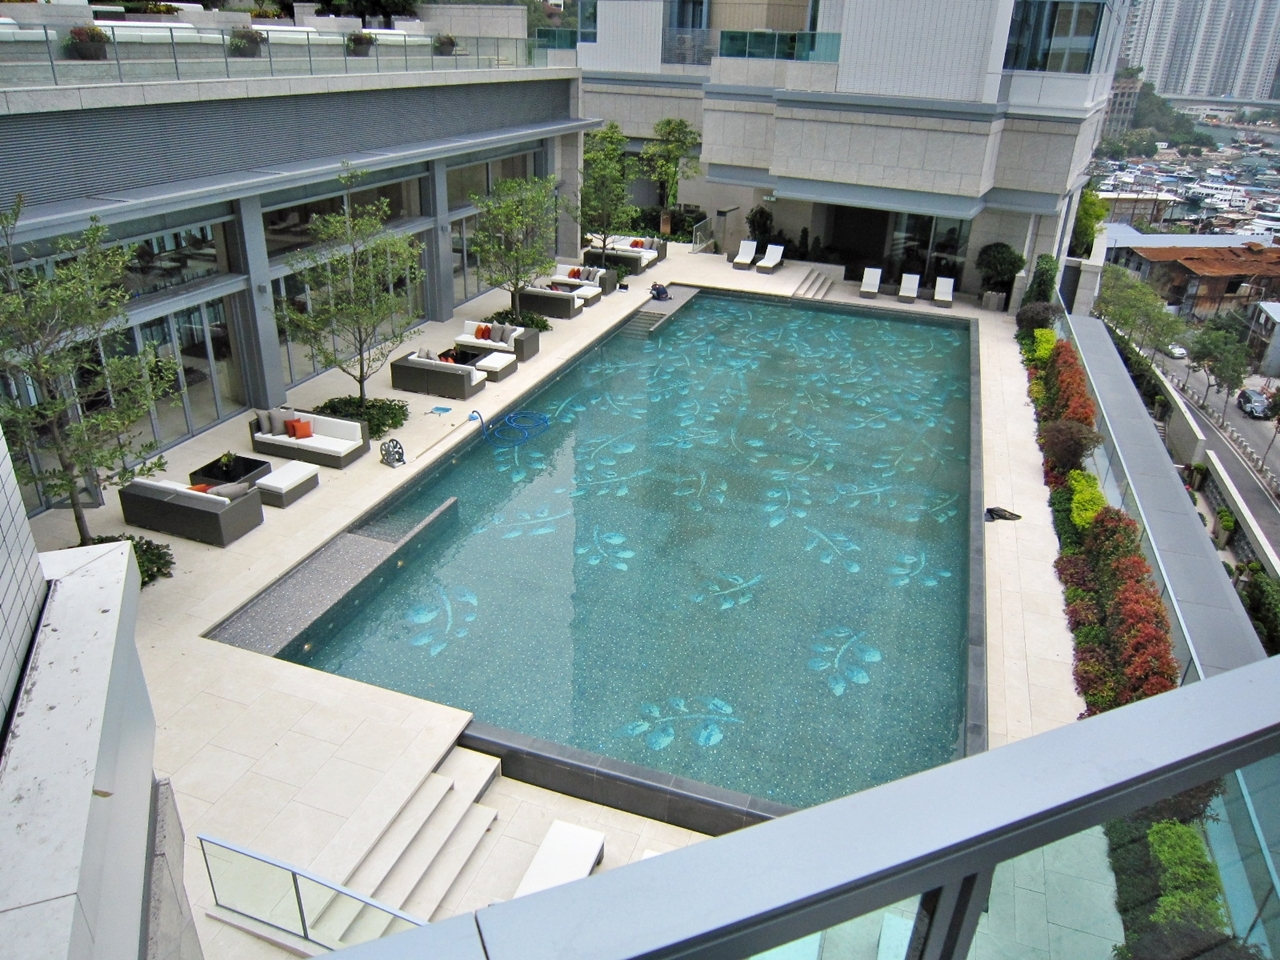 Larvotto Ap Lei Chau Apartment For Rent Executive Homes